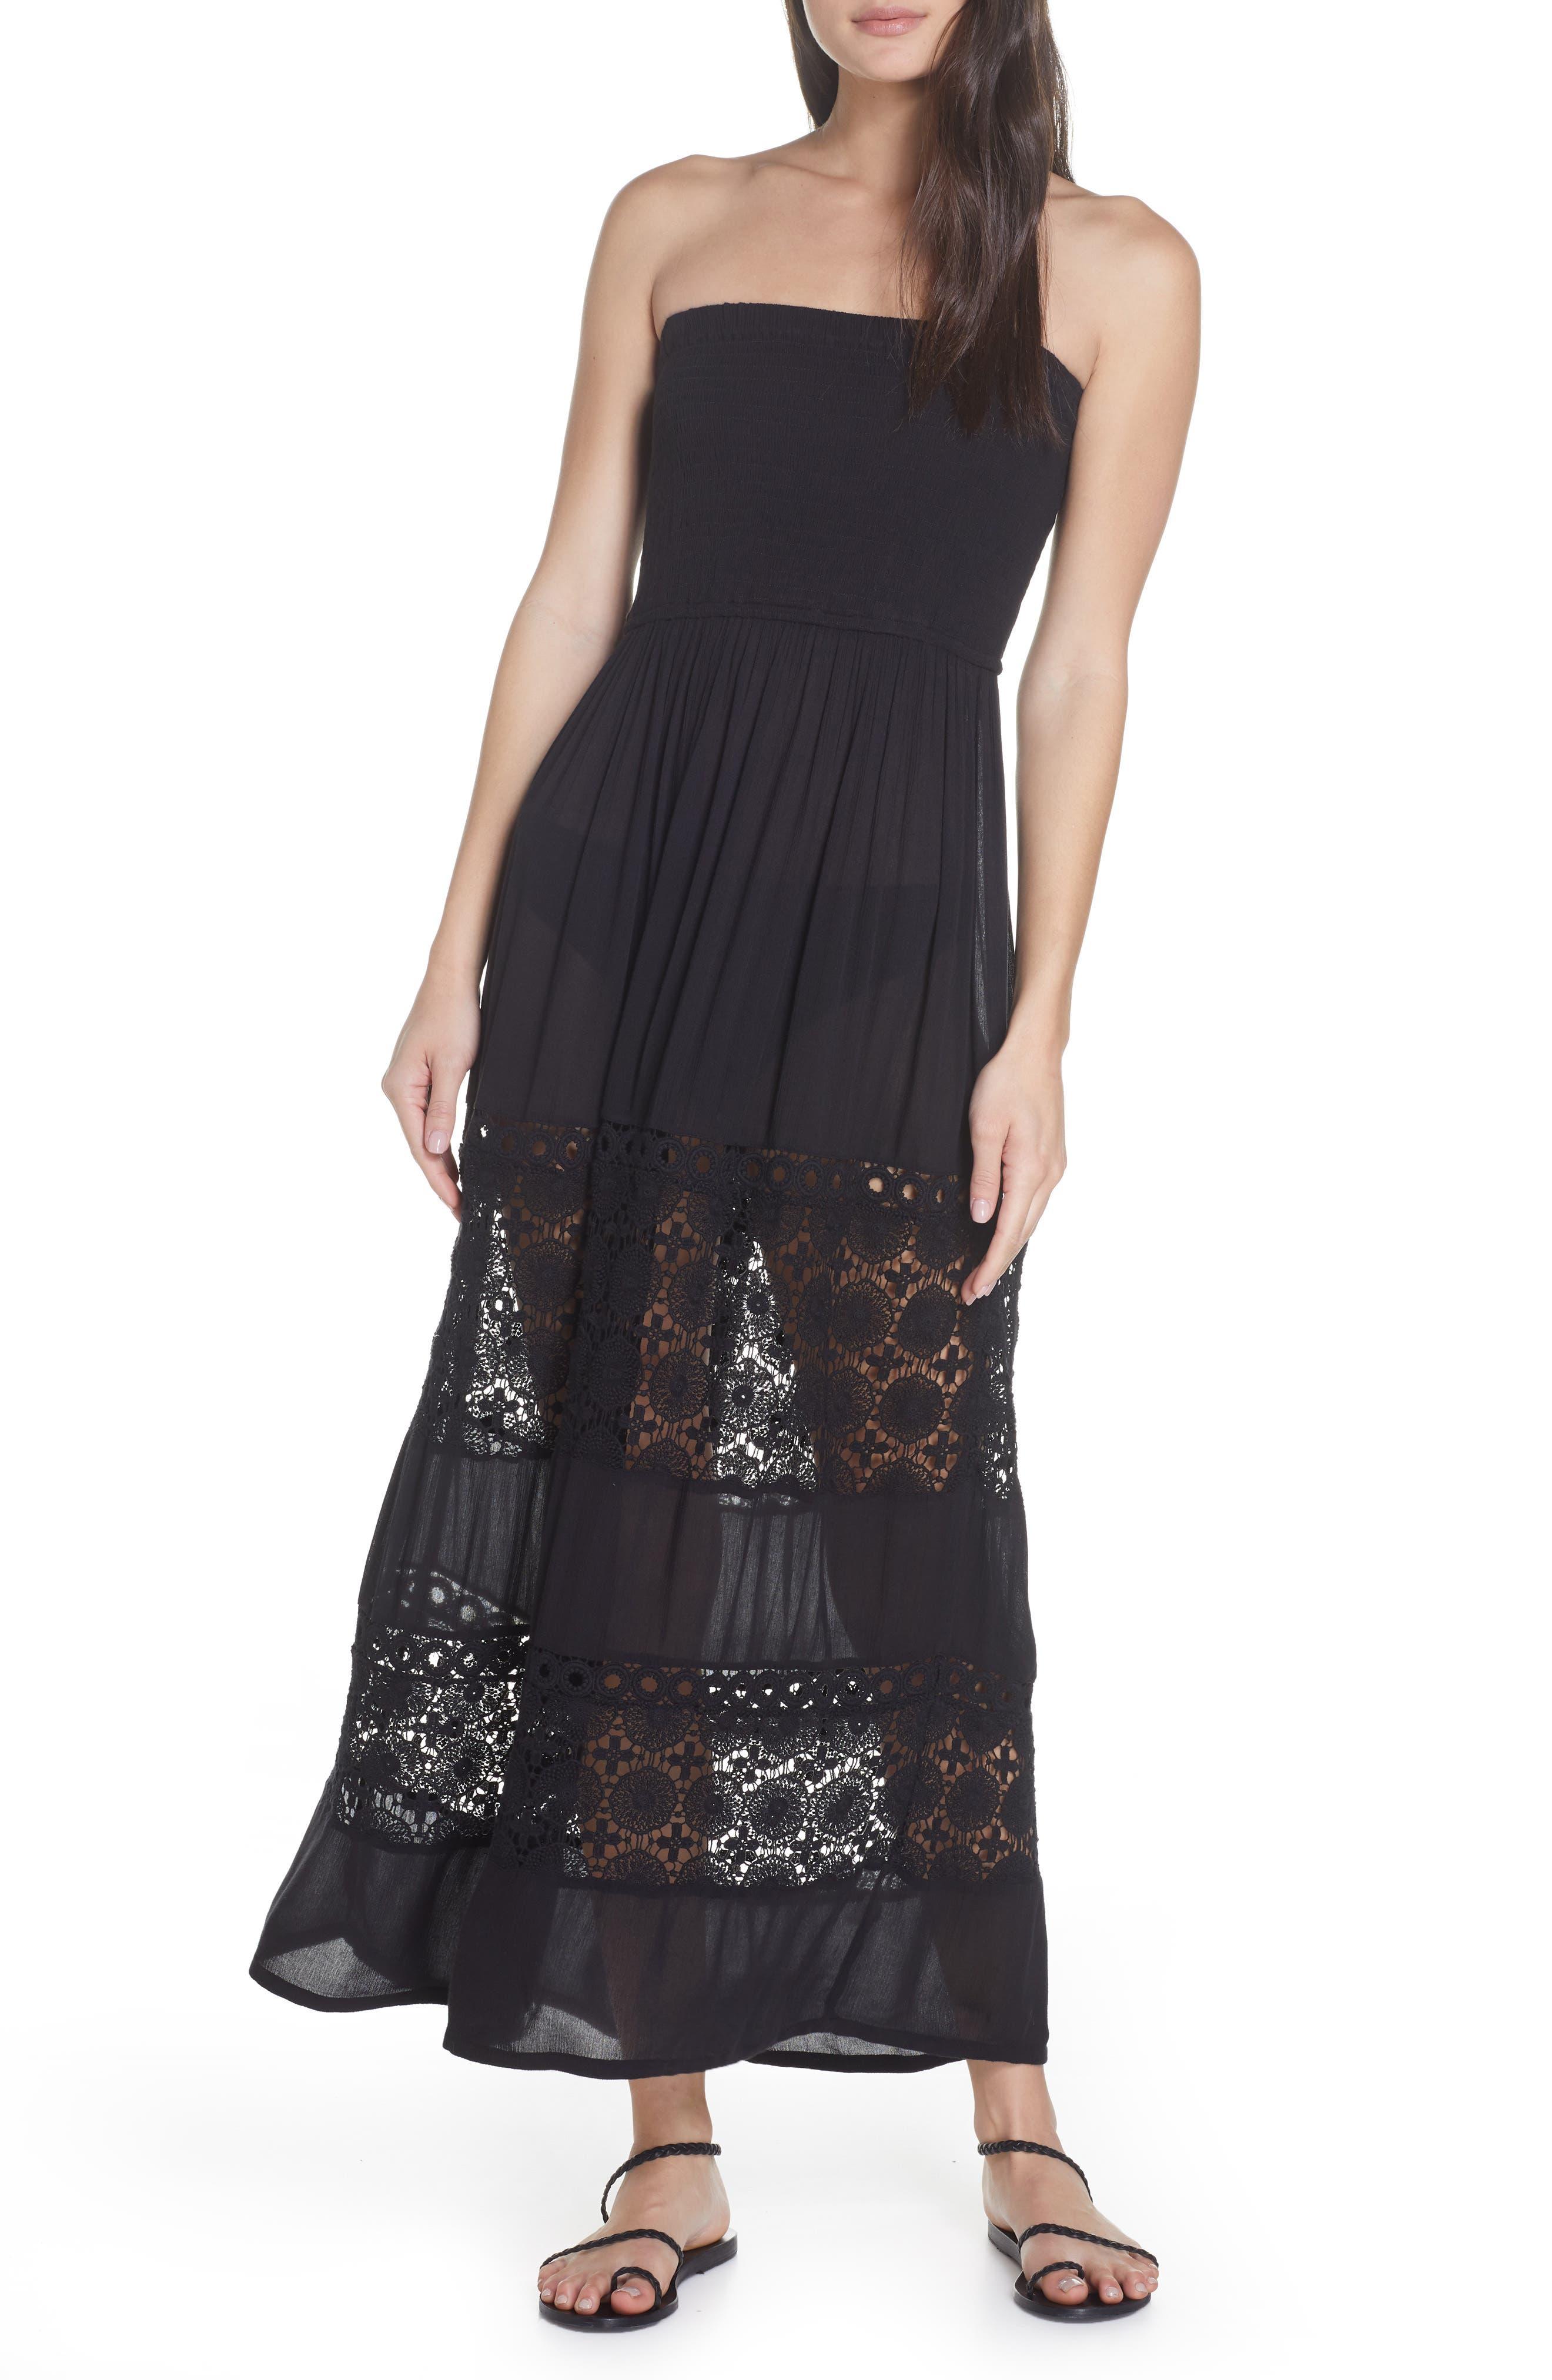 CHELSEA28 Farrah Smocked Cover-Up Maxi Dress, Main, color, BLACK